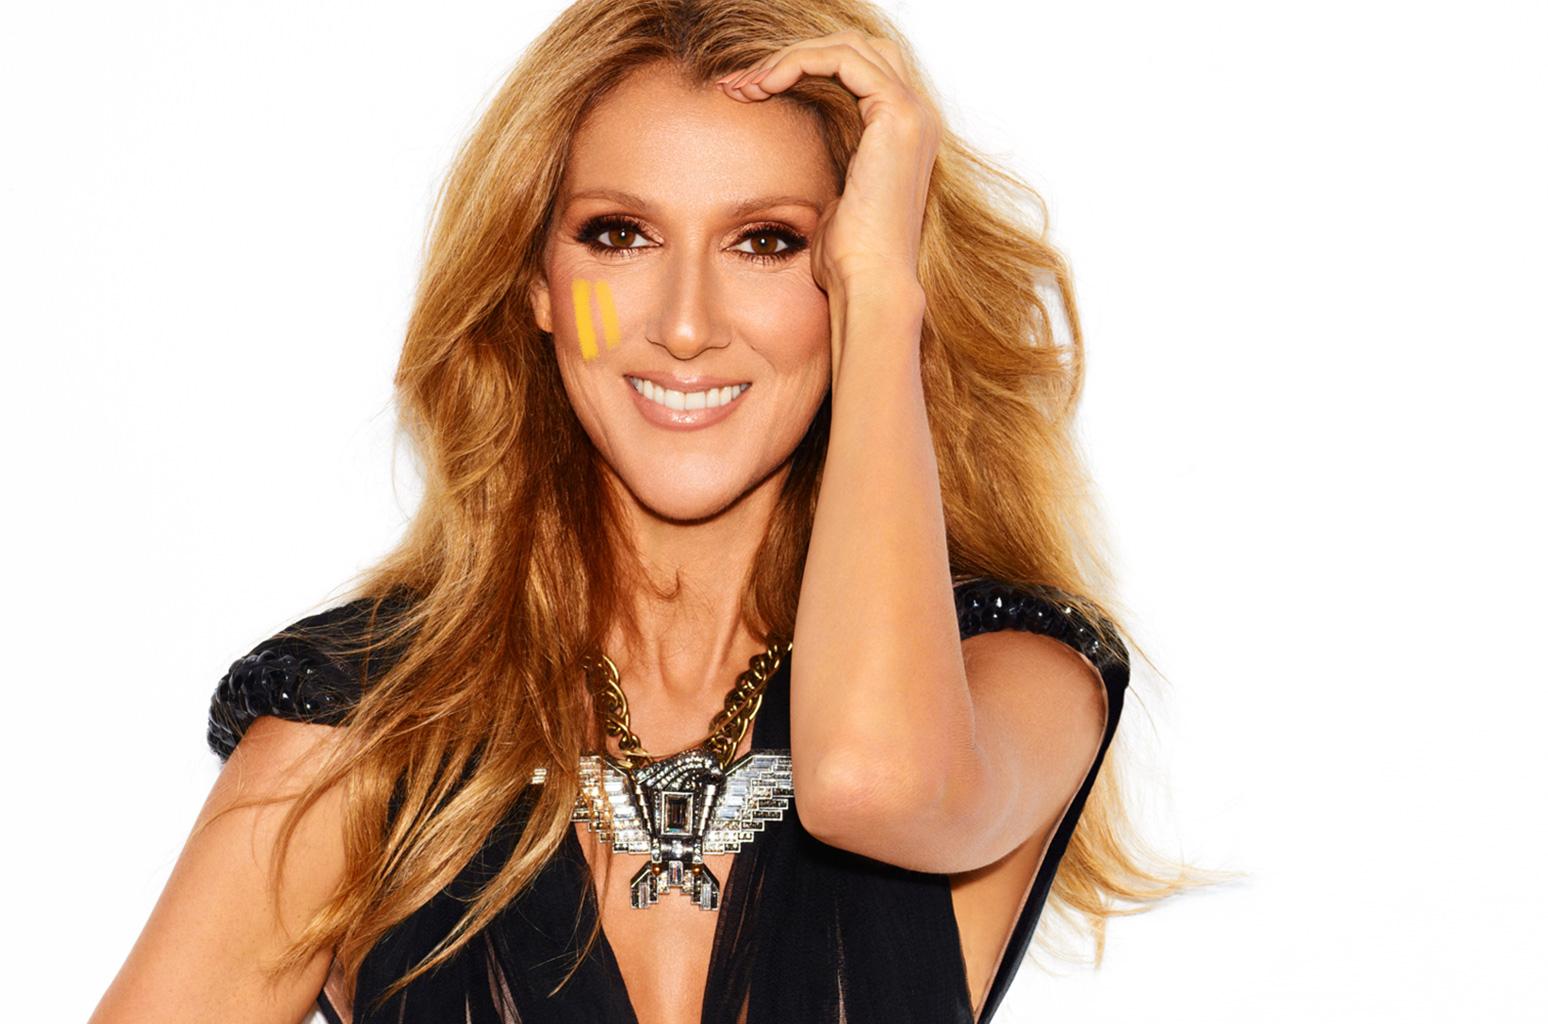 Celine-Dion-press-photo-2017a-billboard-1548.jpg